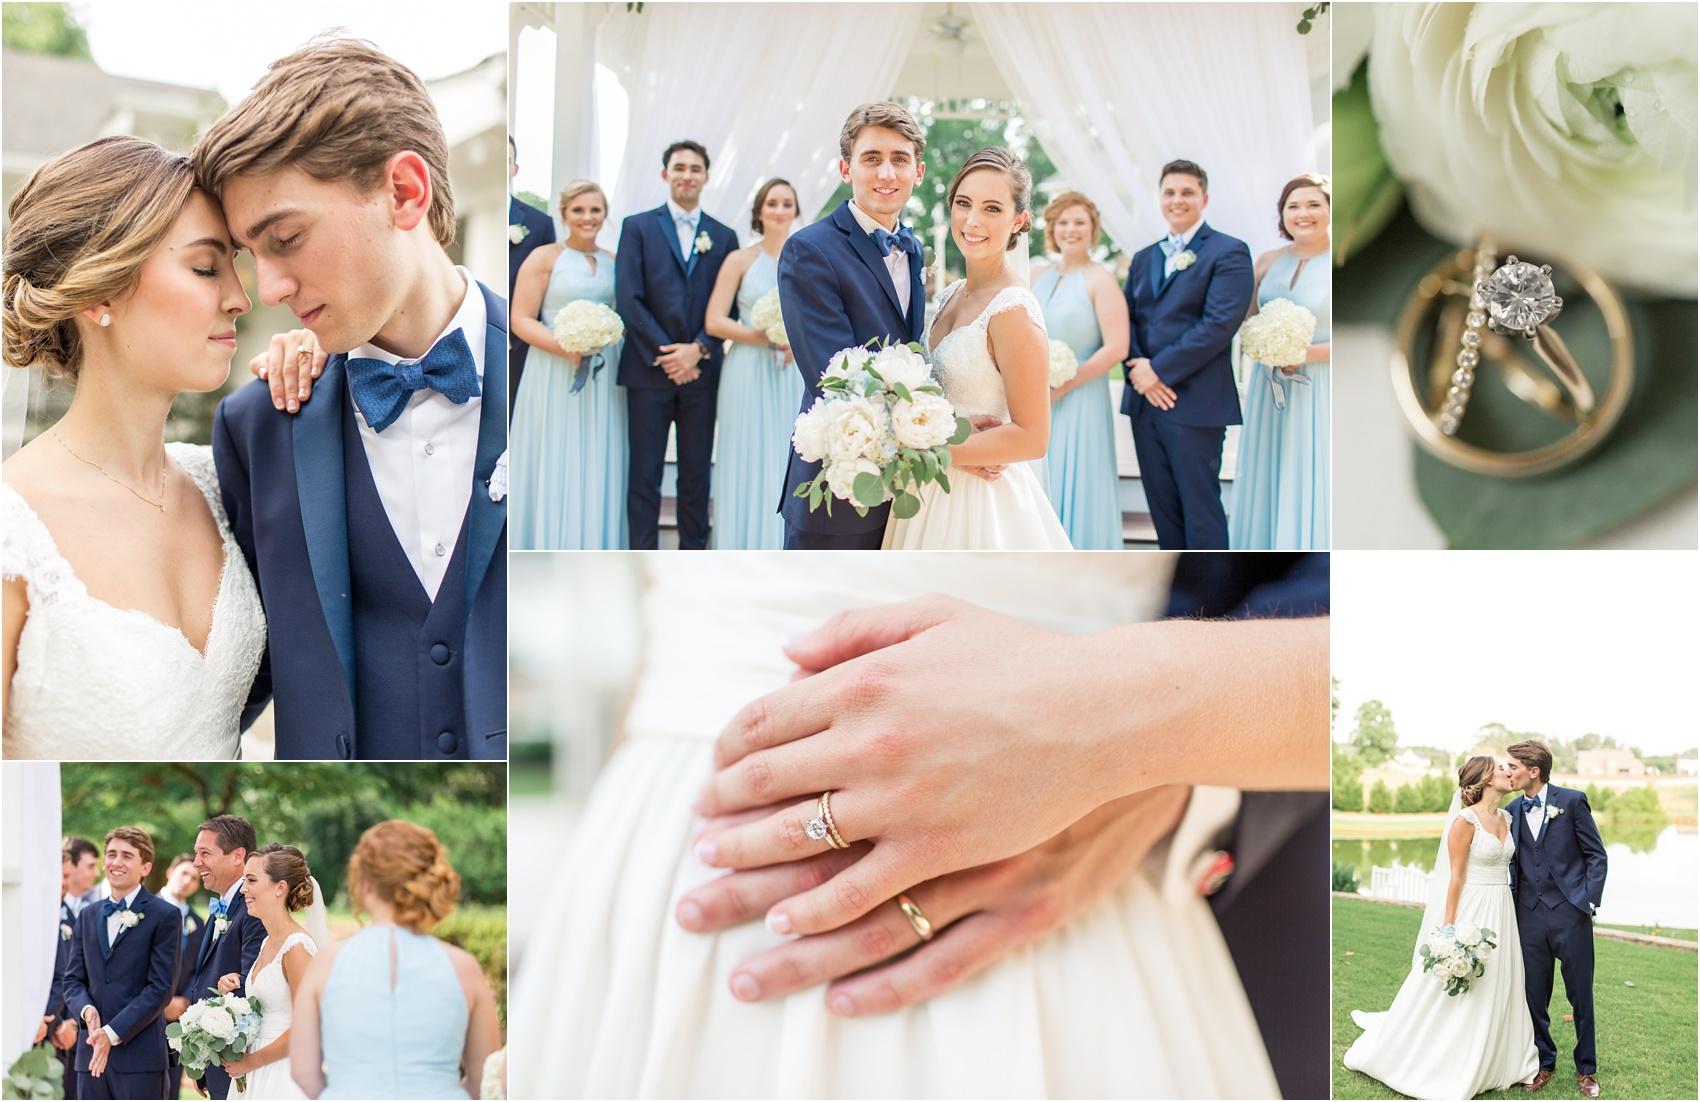 Savannah Eve Photography- Sigl-Adams Wedding- Sneak Peek-58-1.jpg